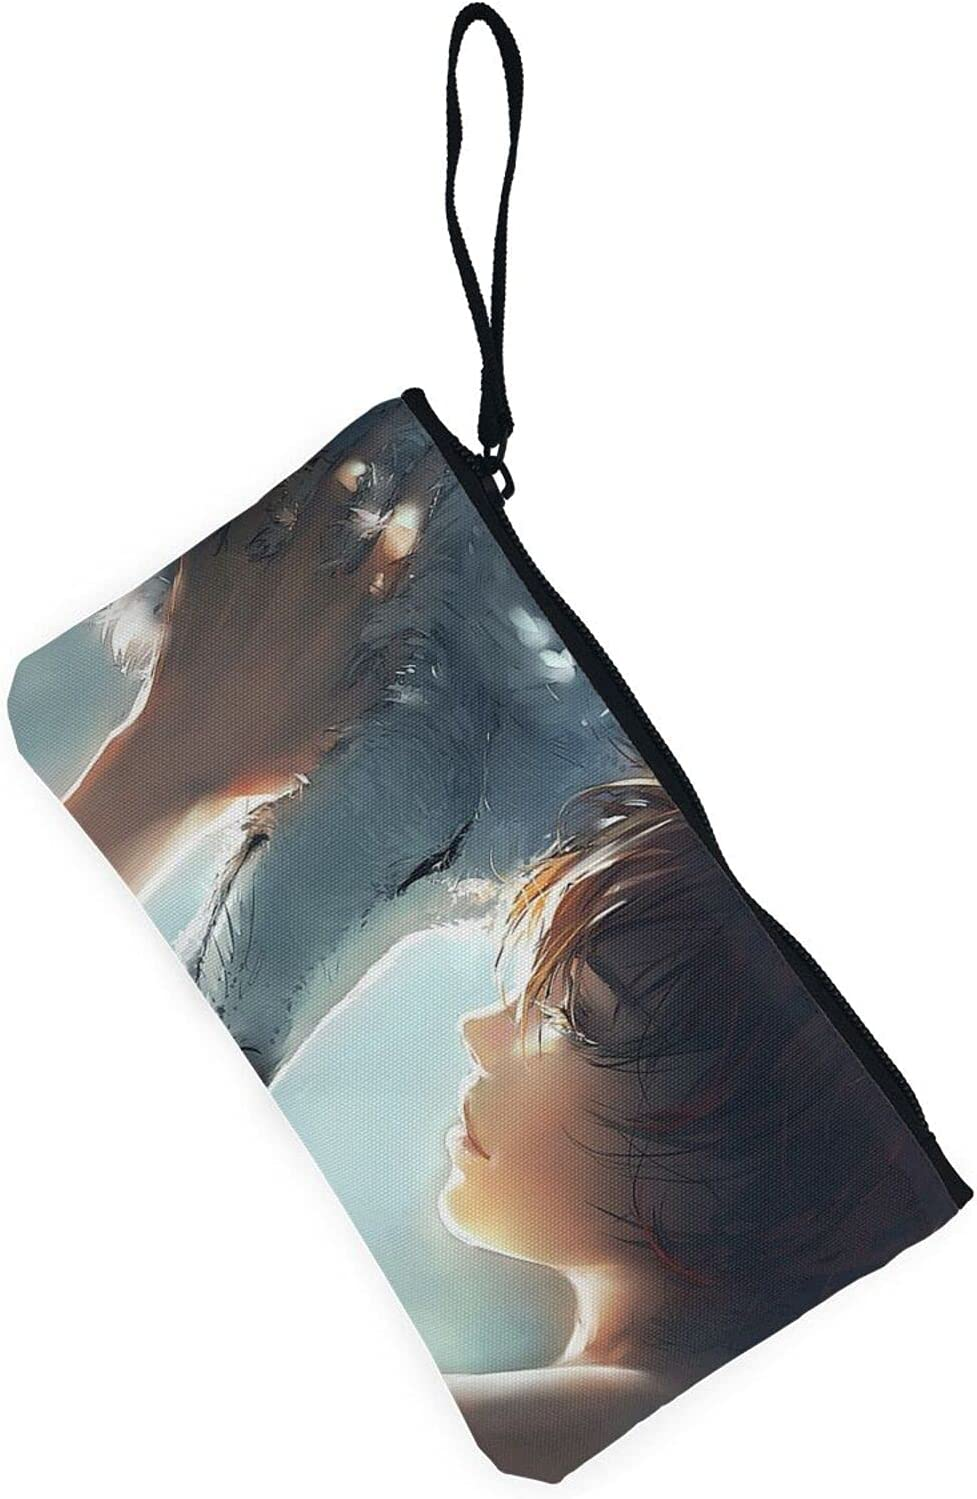 AORRUAM Wolf and woman Canvas Coin Purse,Canvas Zipper Pencil Cases,Canvas Change Purse Pouch Mini Wallet Coin Bag